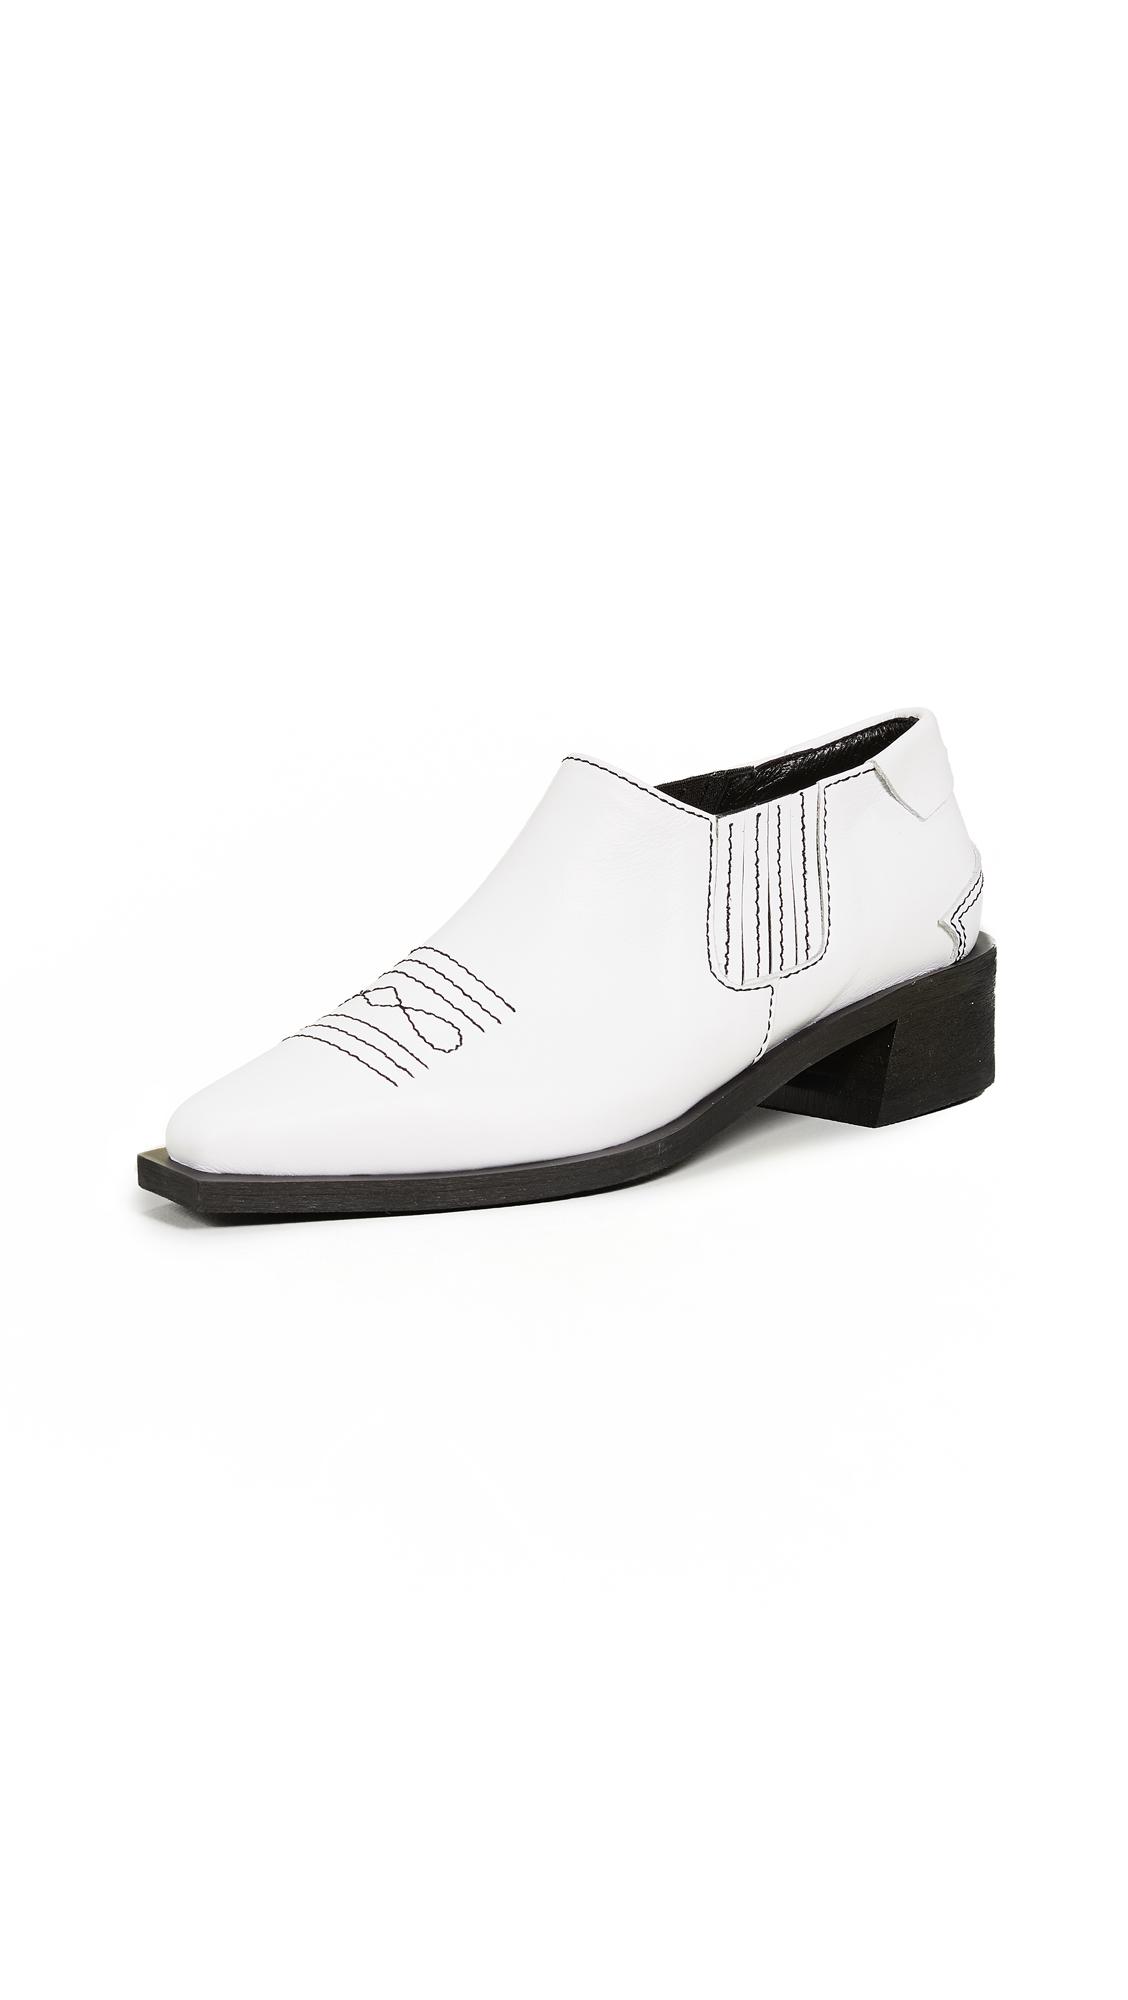 Reike Nen Western Shootie Boots - White